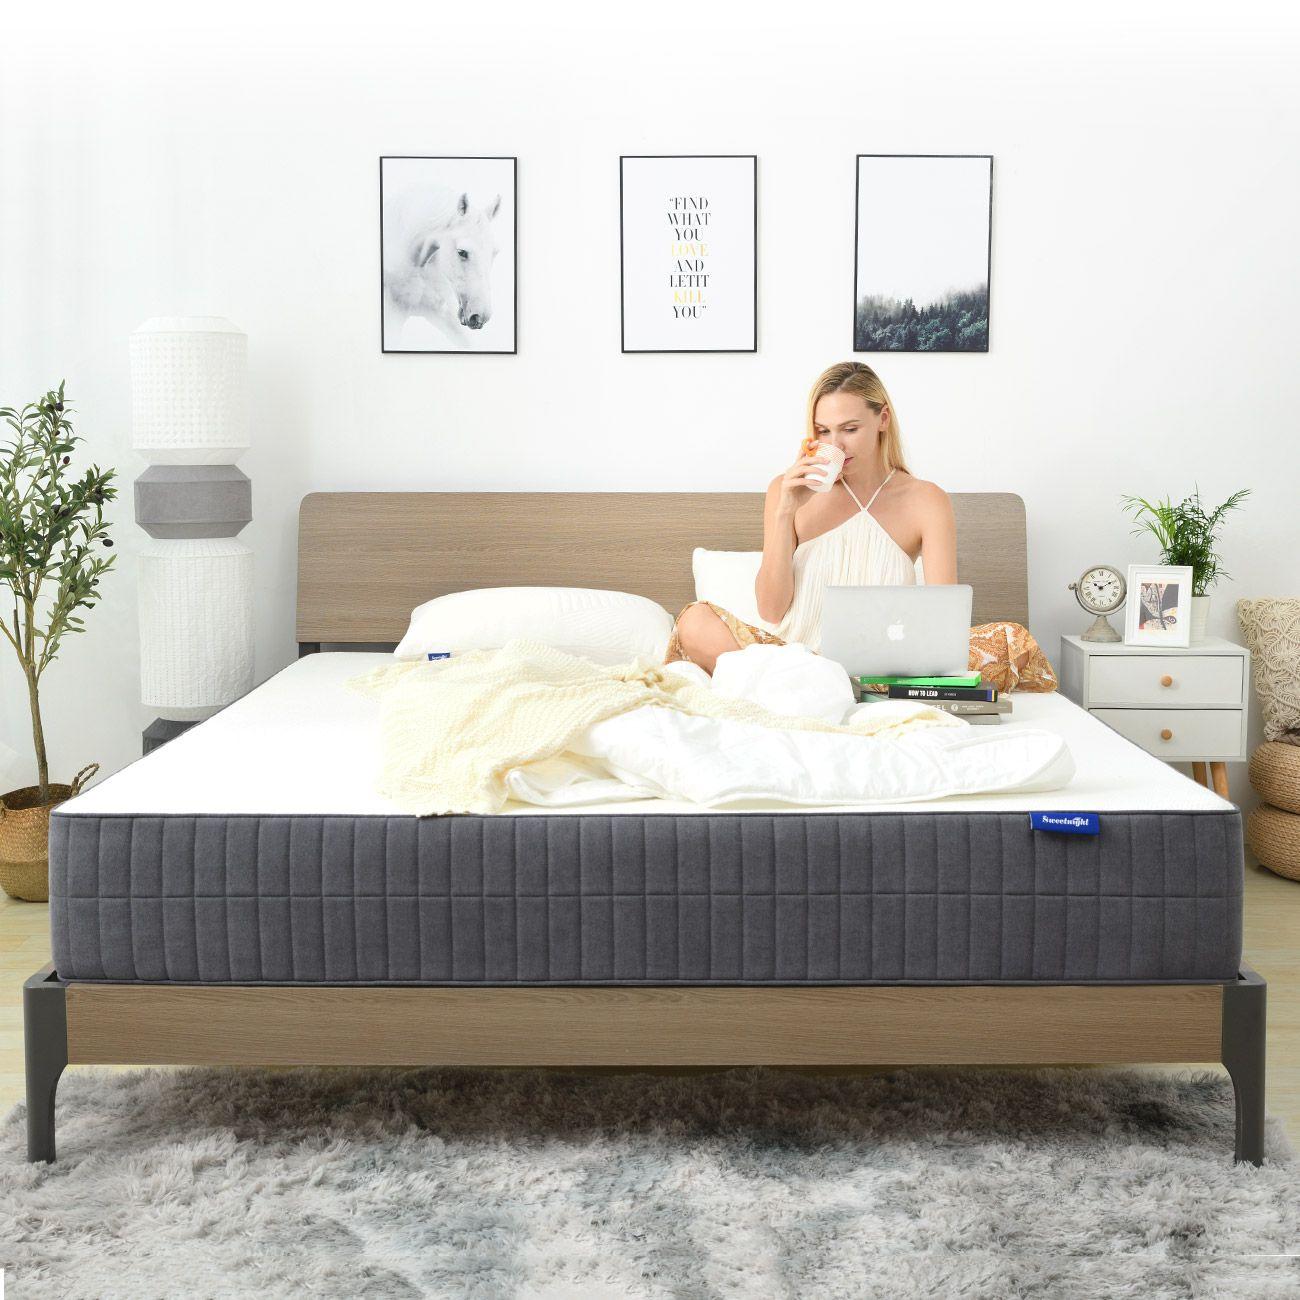 Sweetnight Home In 2020 Bed Mattress Sizes Mattress Sizes Memory Foam Mattress